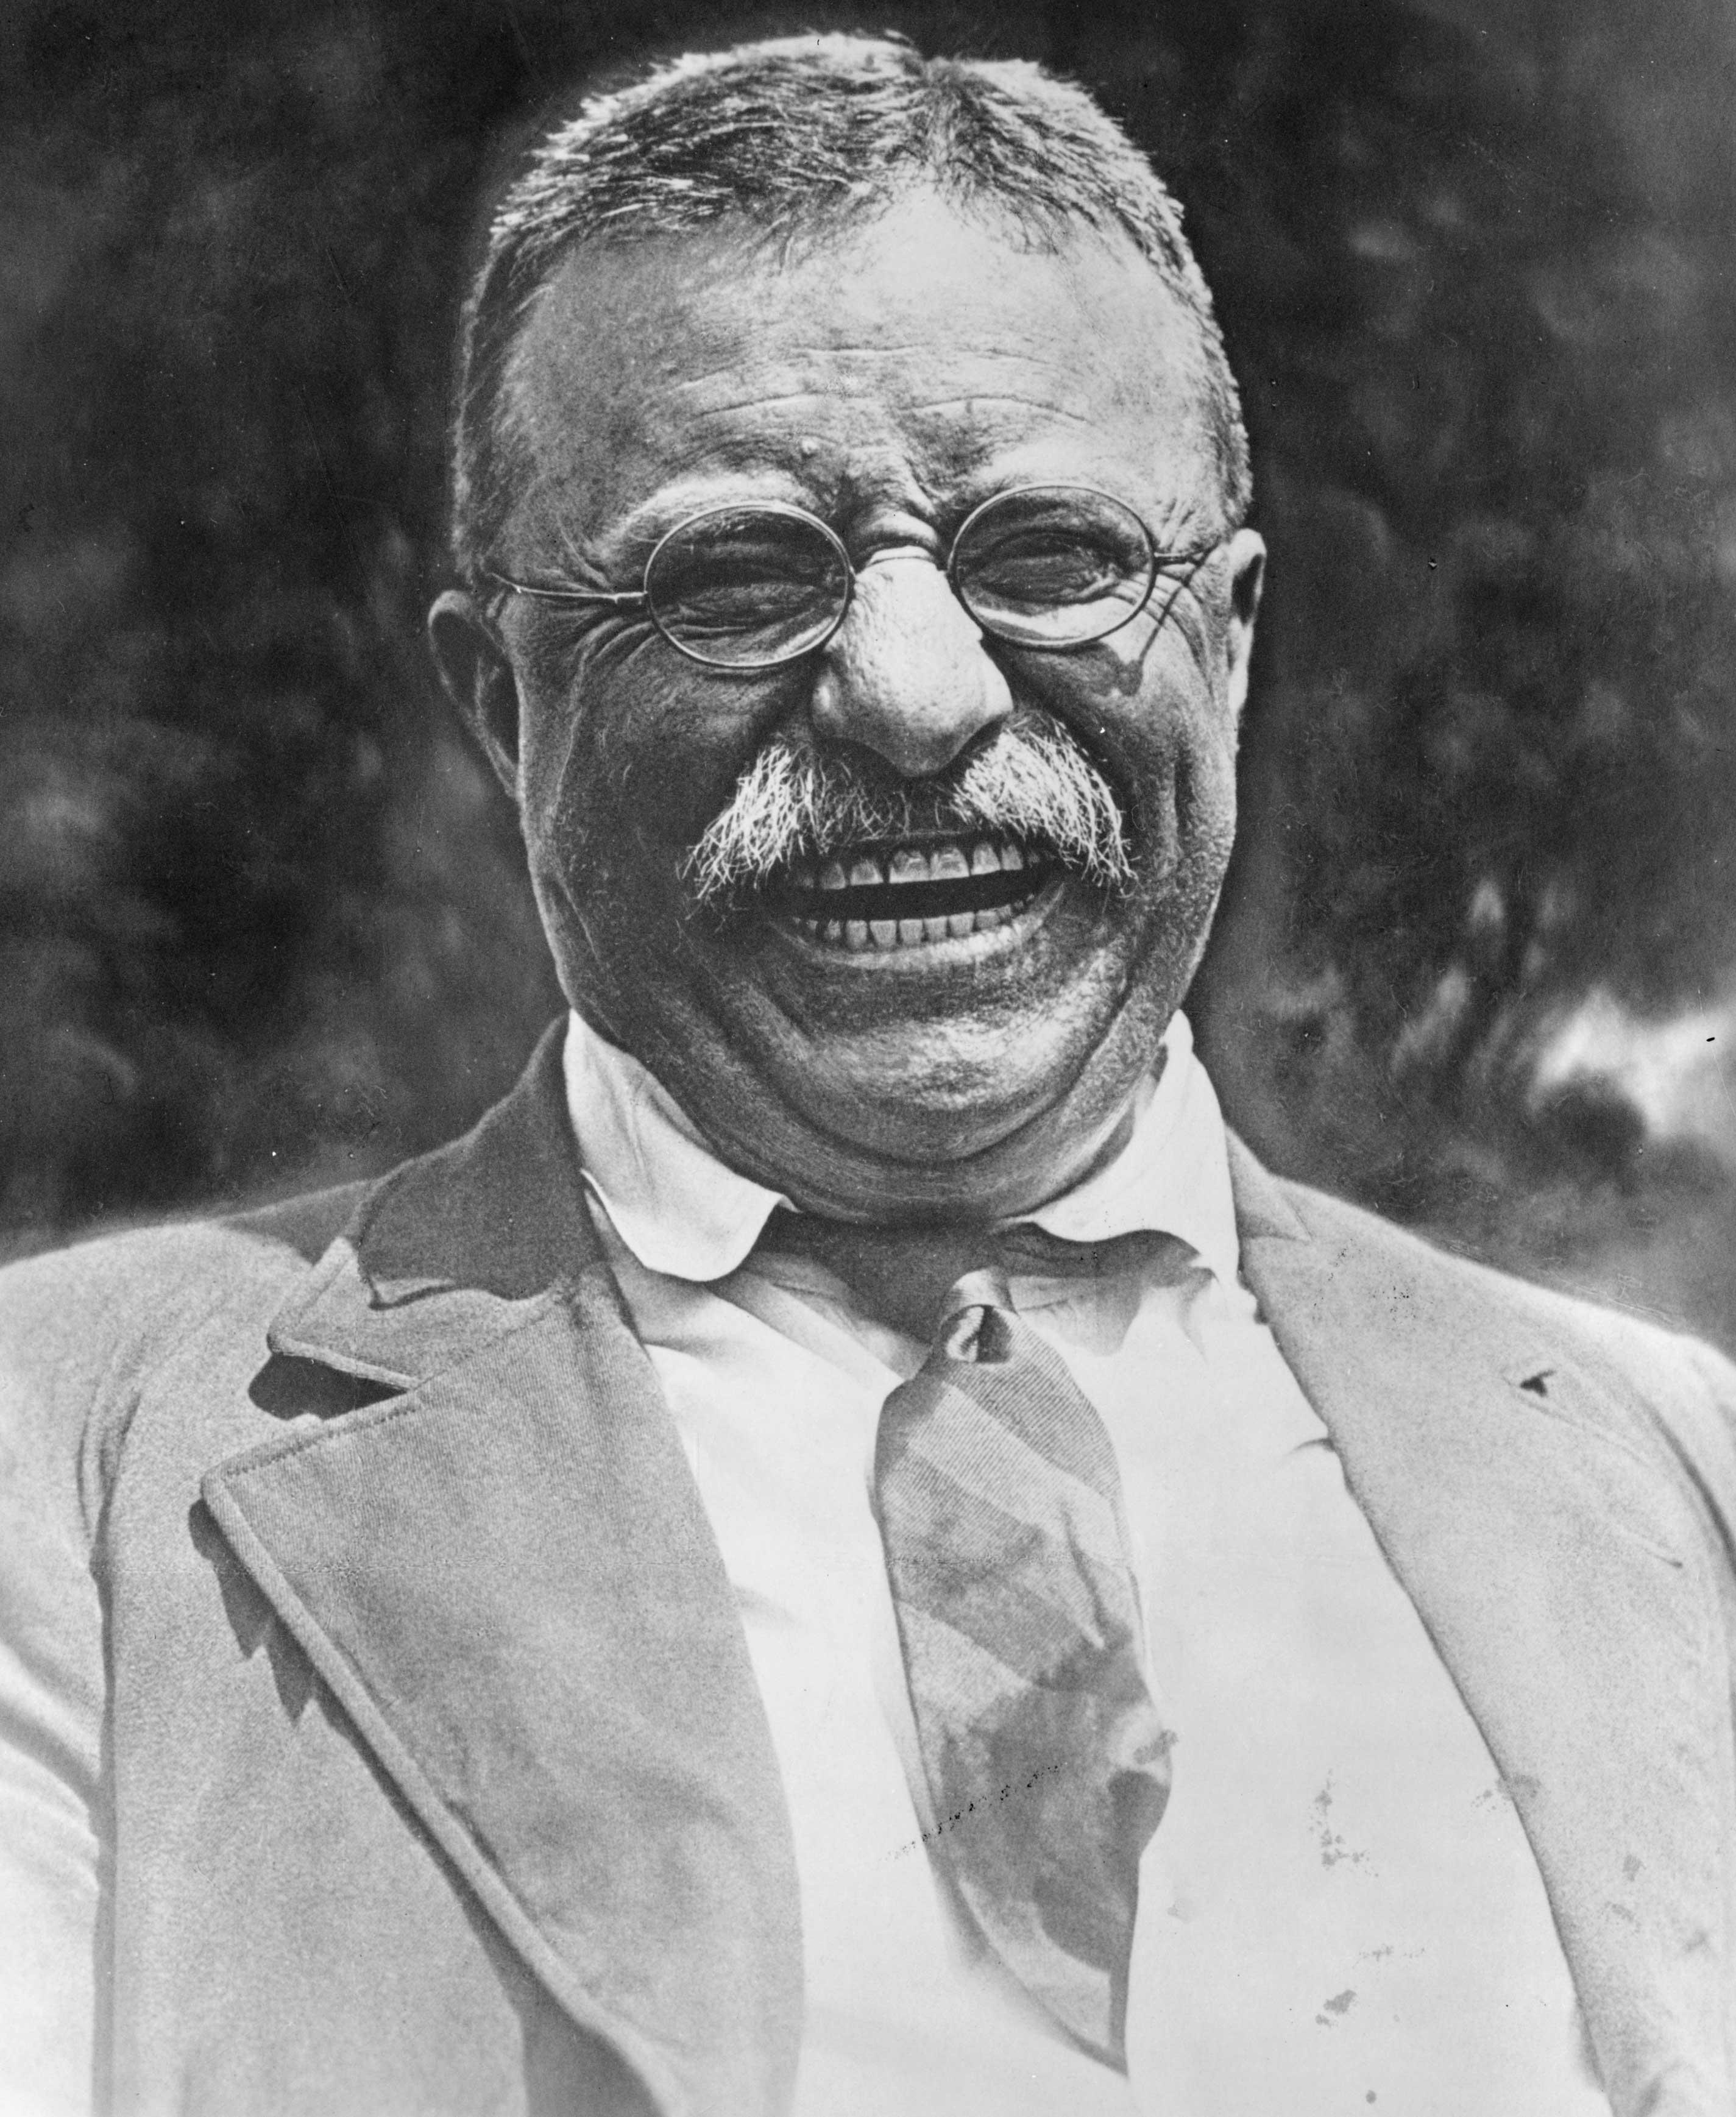 Dreamy Mr. Roosevelt